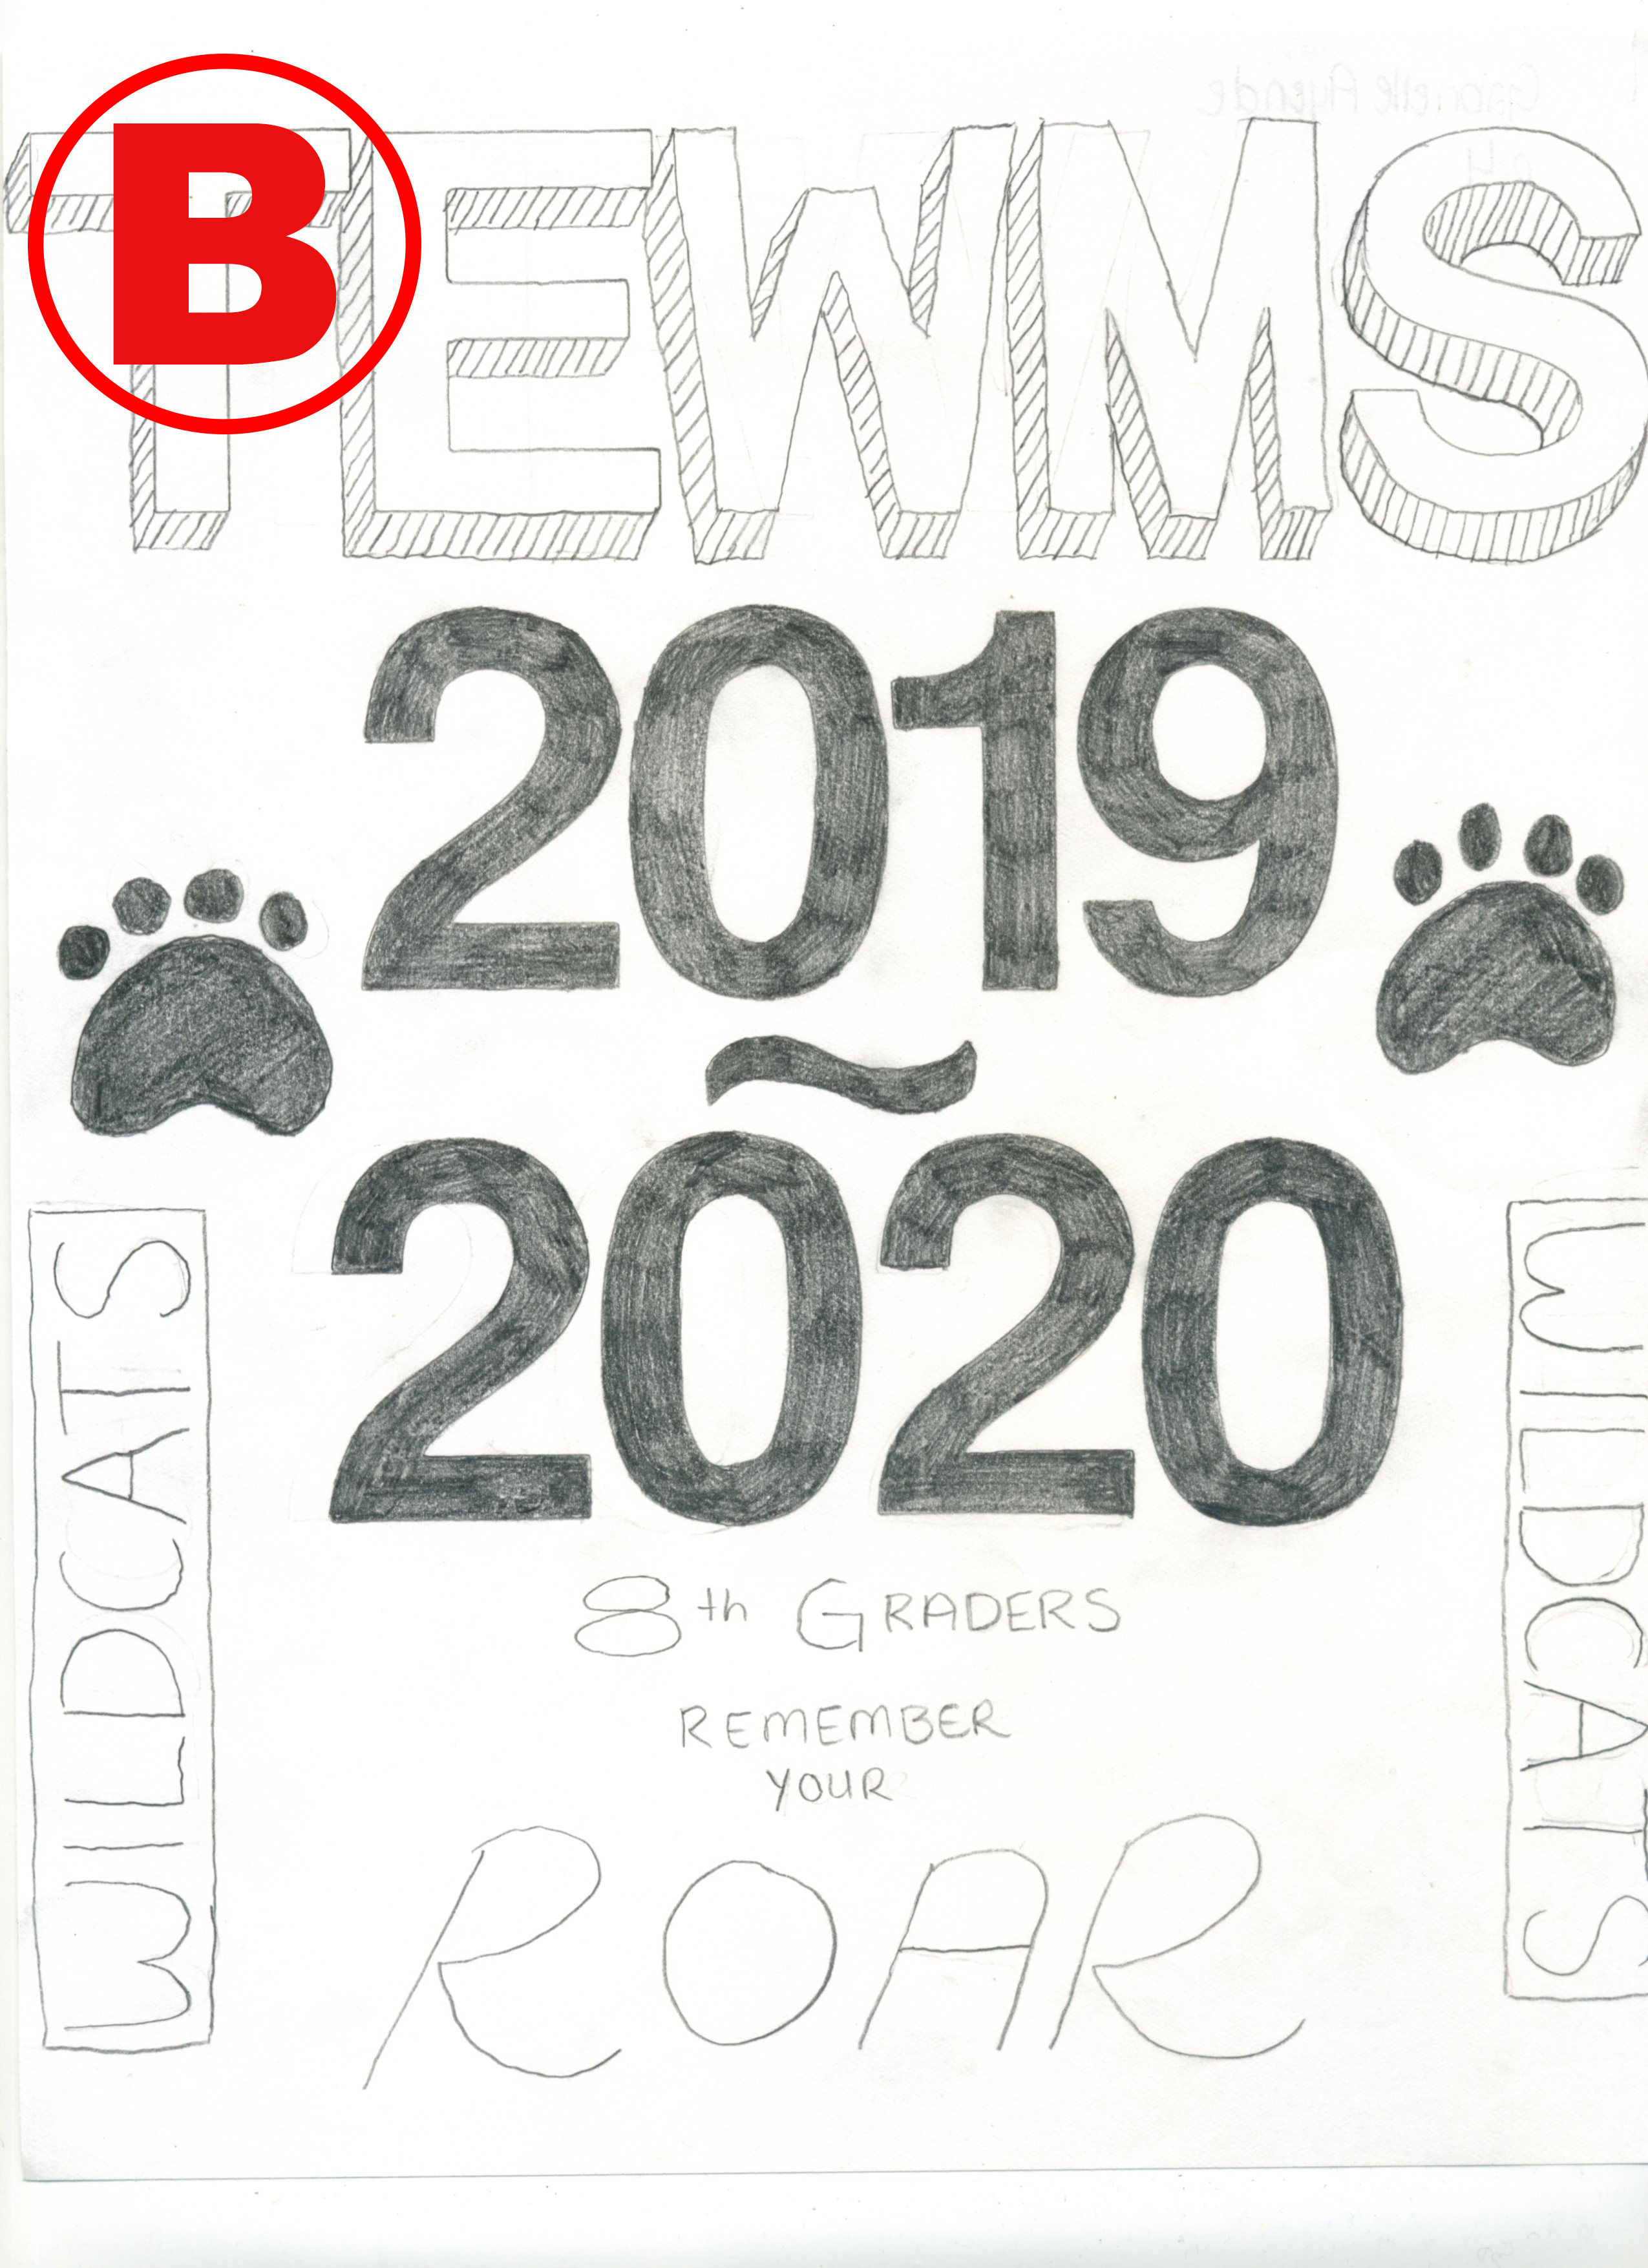 8th Grade Study Hall Binder Cover